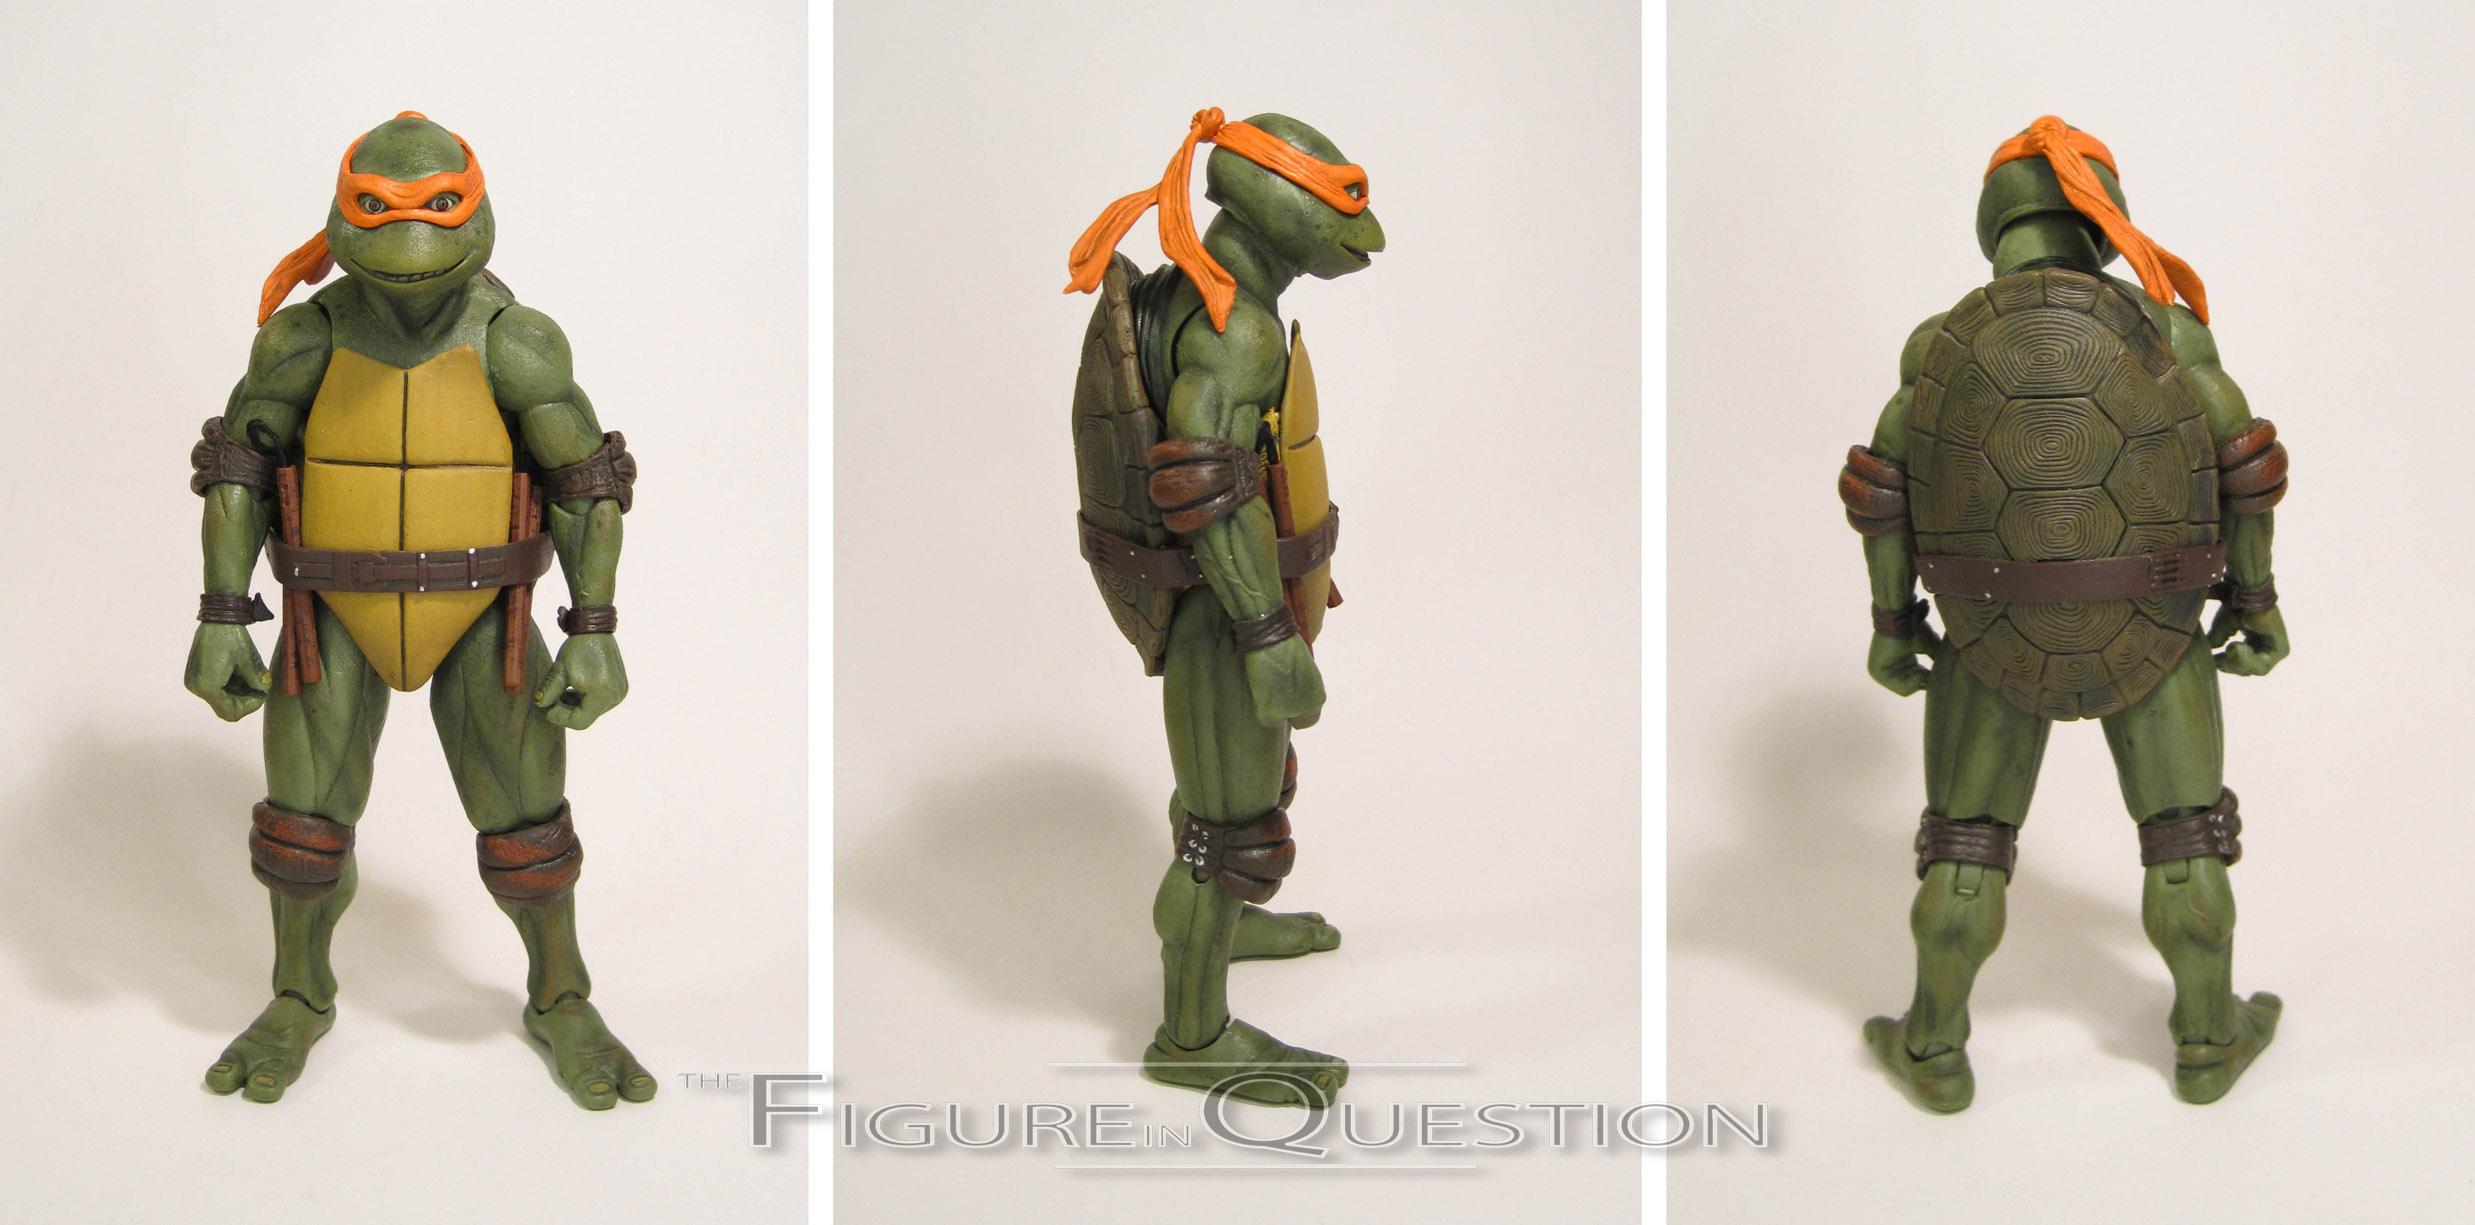 Teenage Mutant Ninja Turtles The Figure In Question